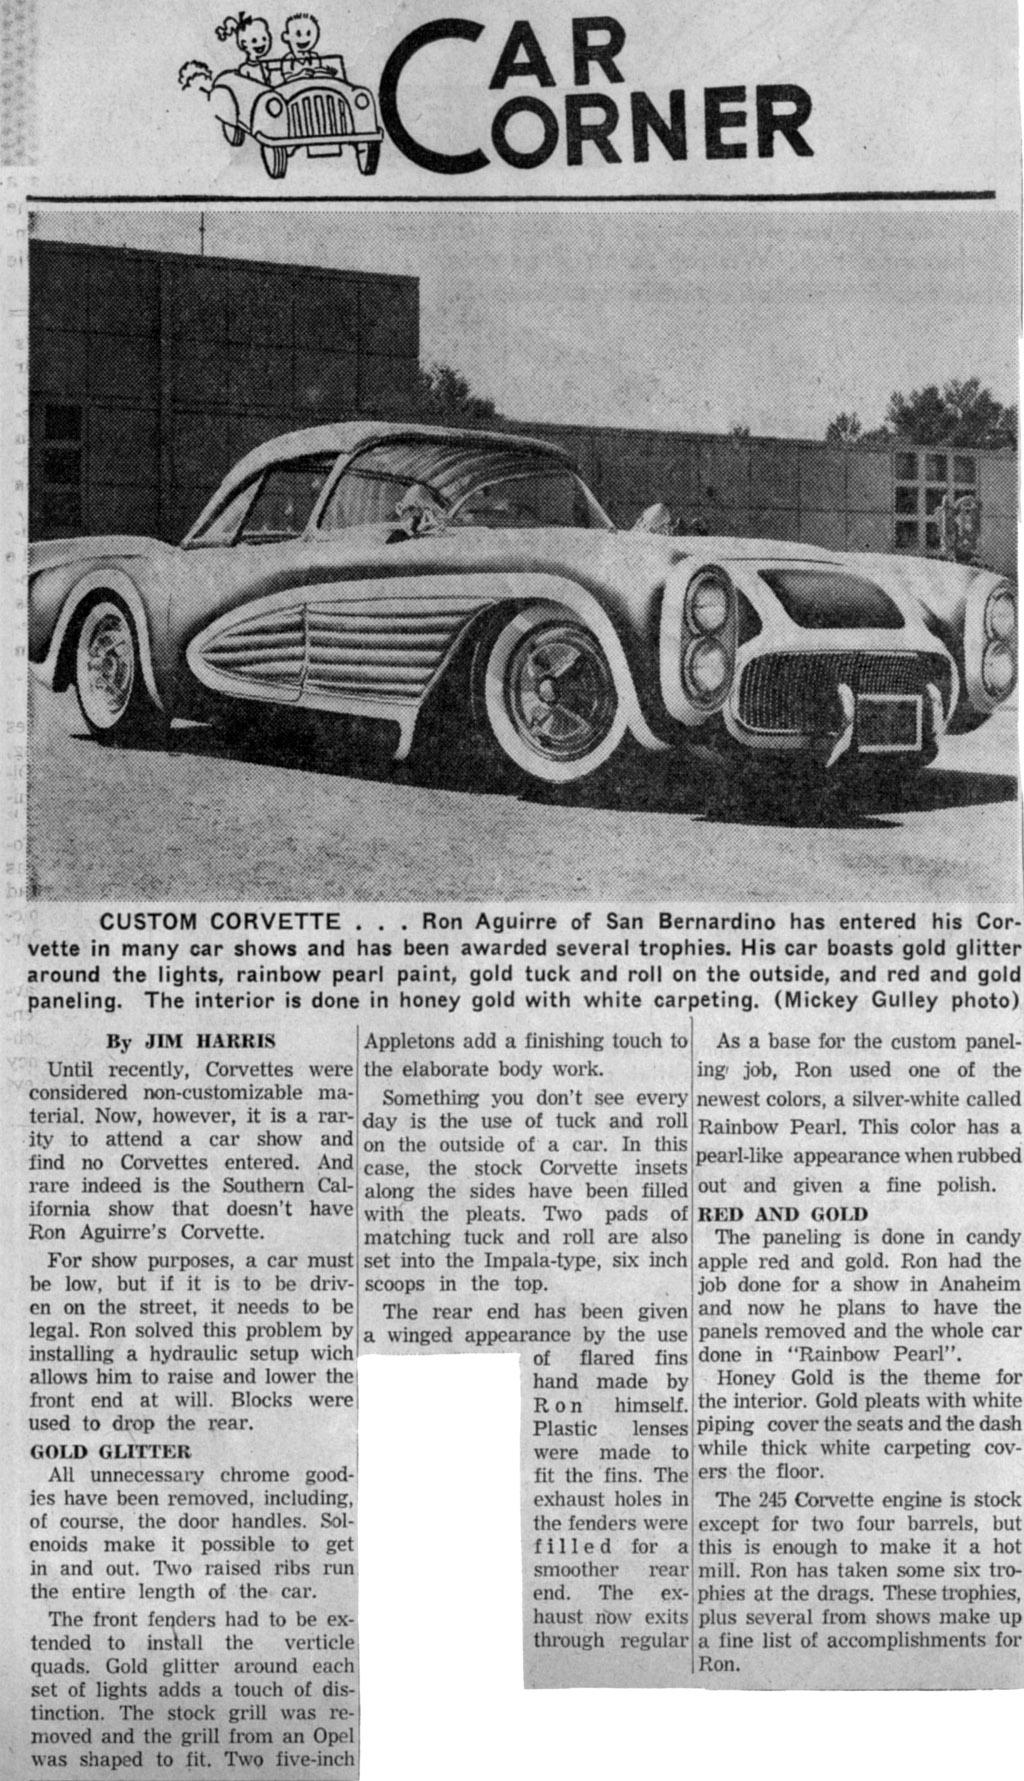 X-Sonic in Car Corner article